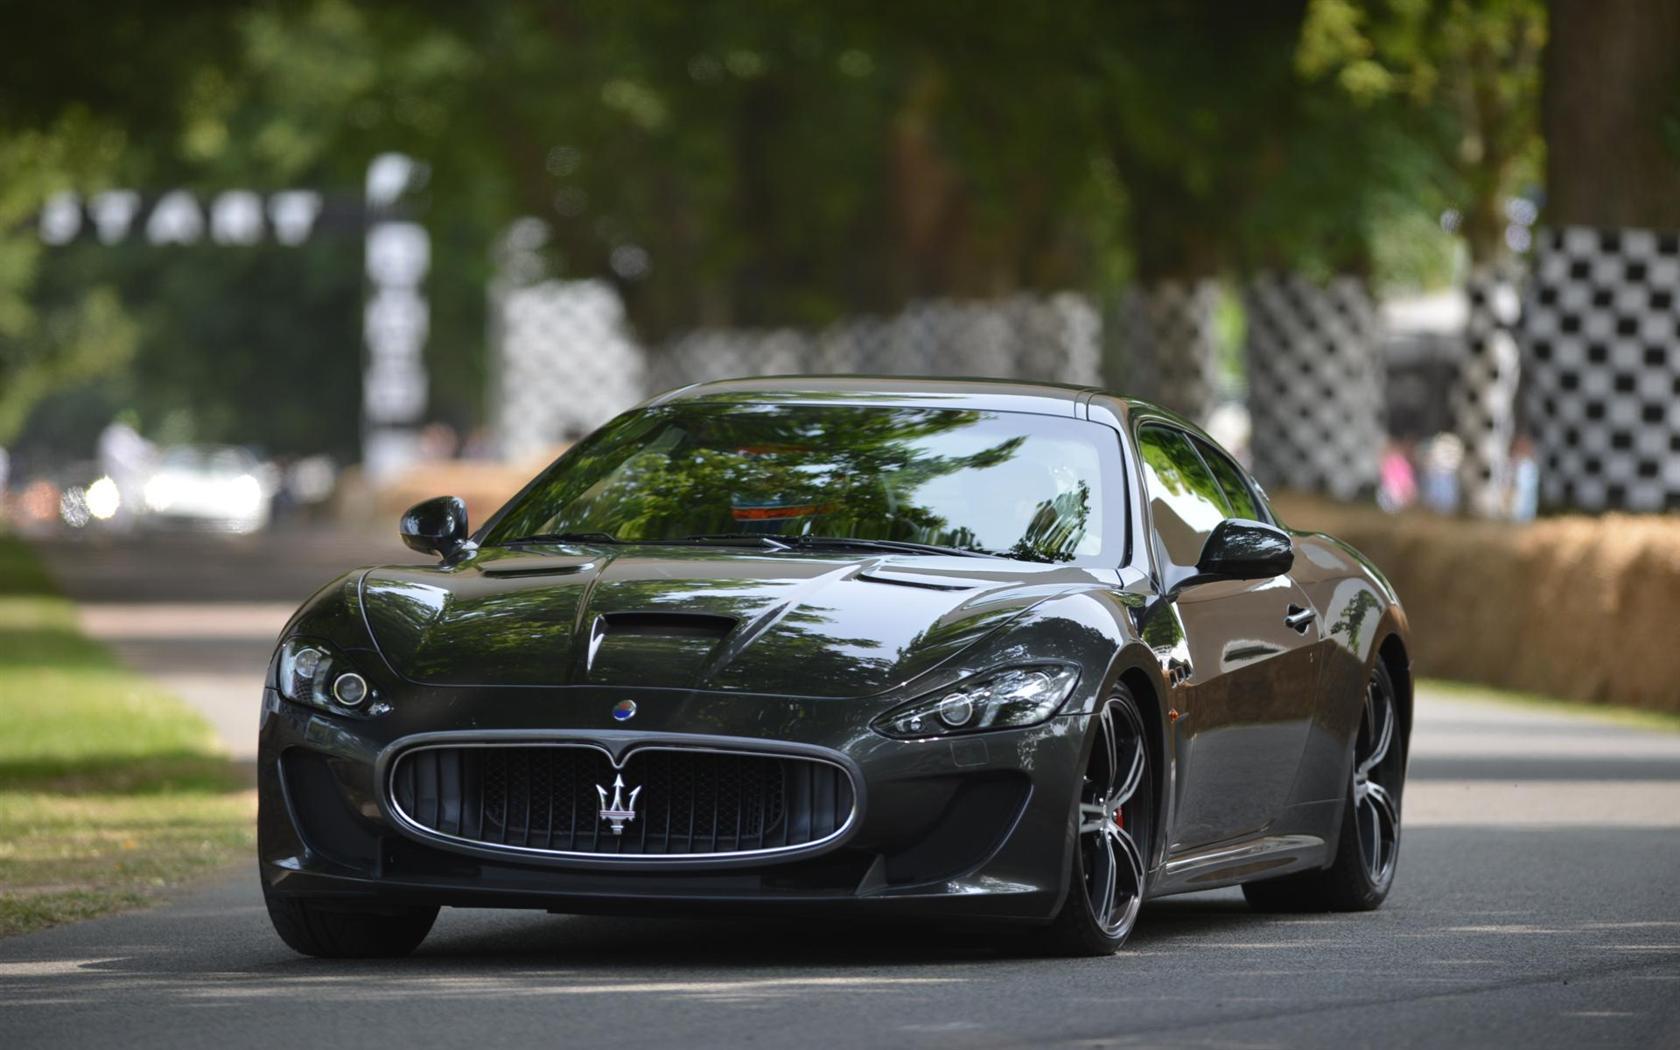 Maserati Alfieri Price >> 2014 Maserati GranTurismo MC Stradale Image